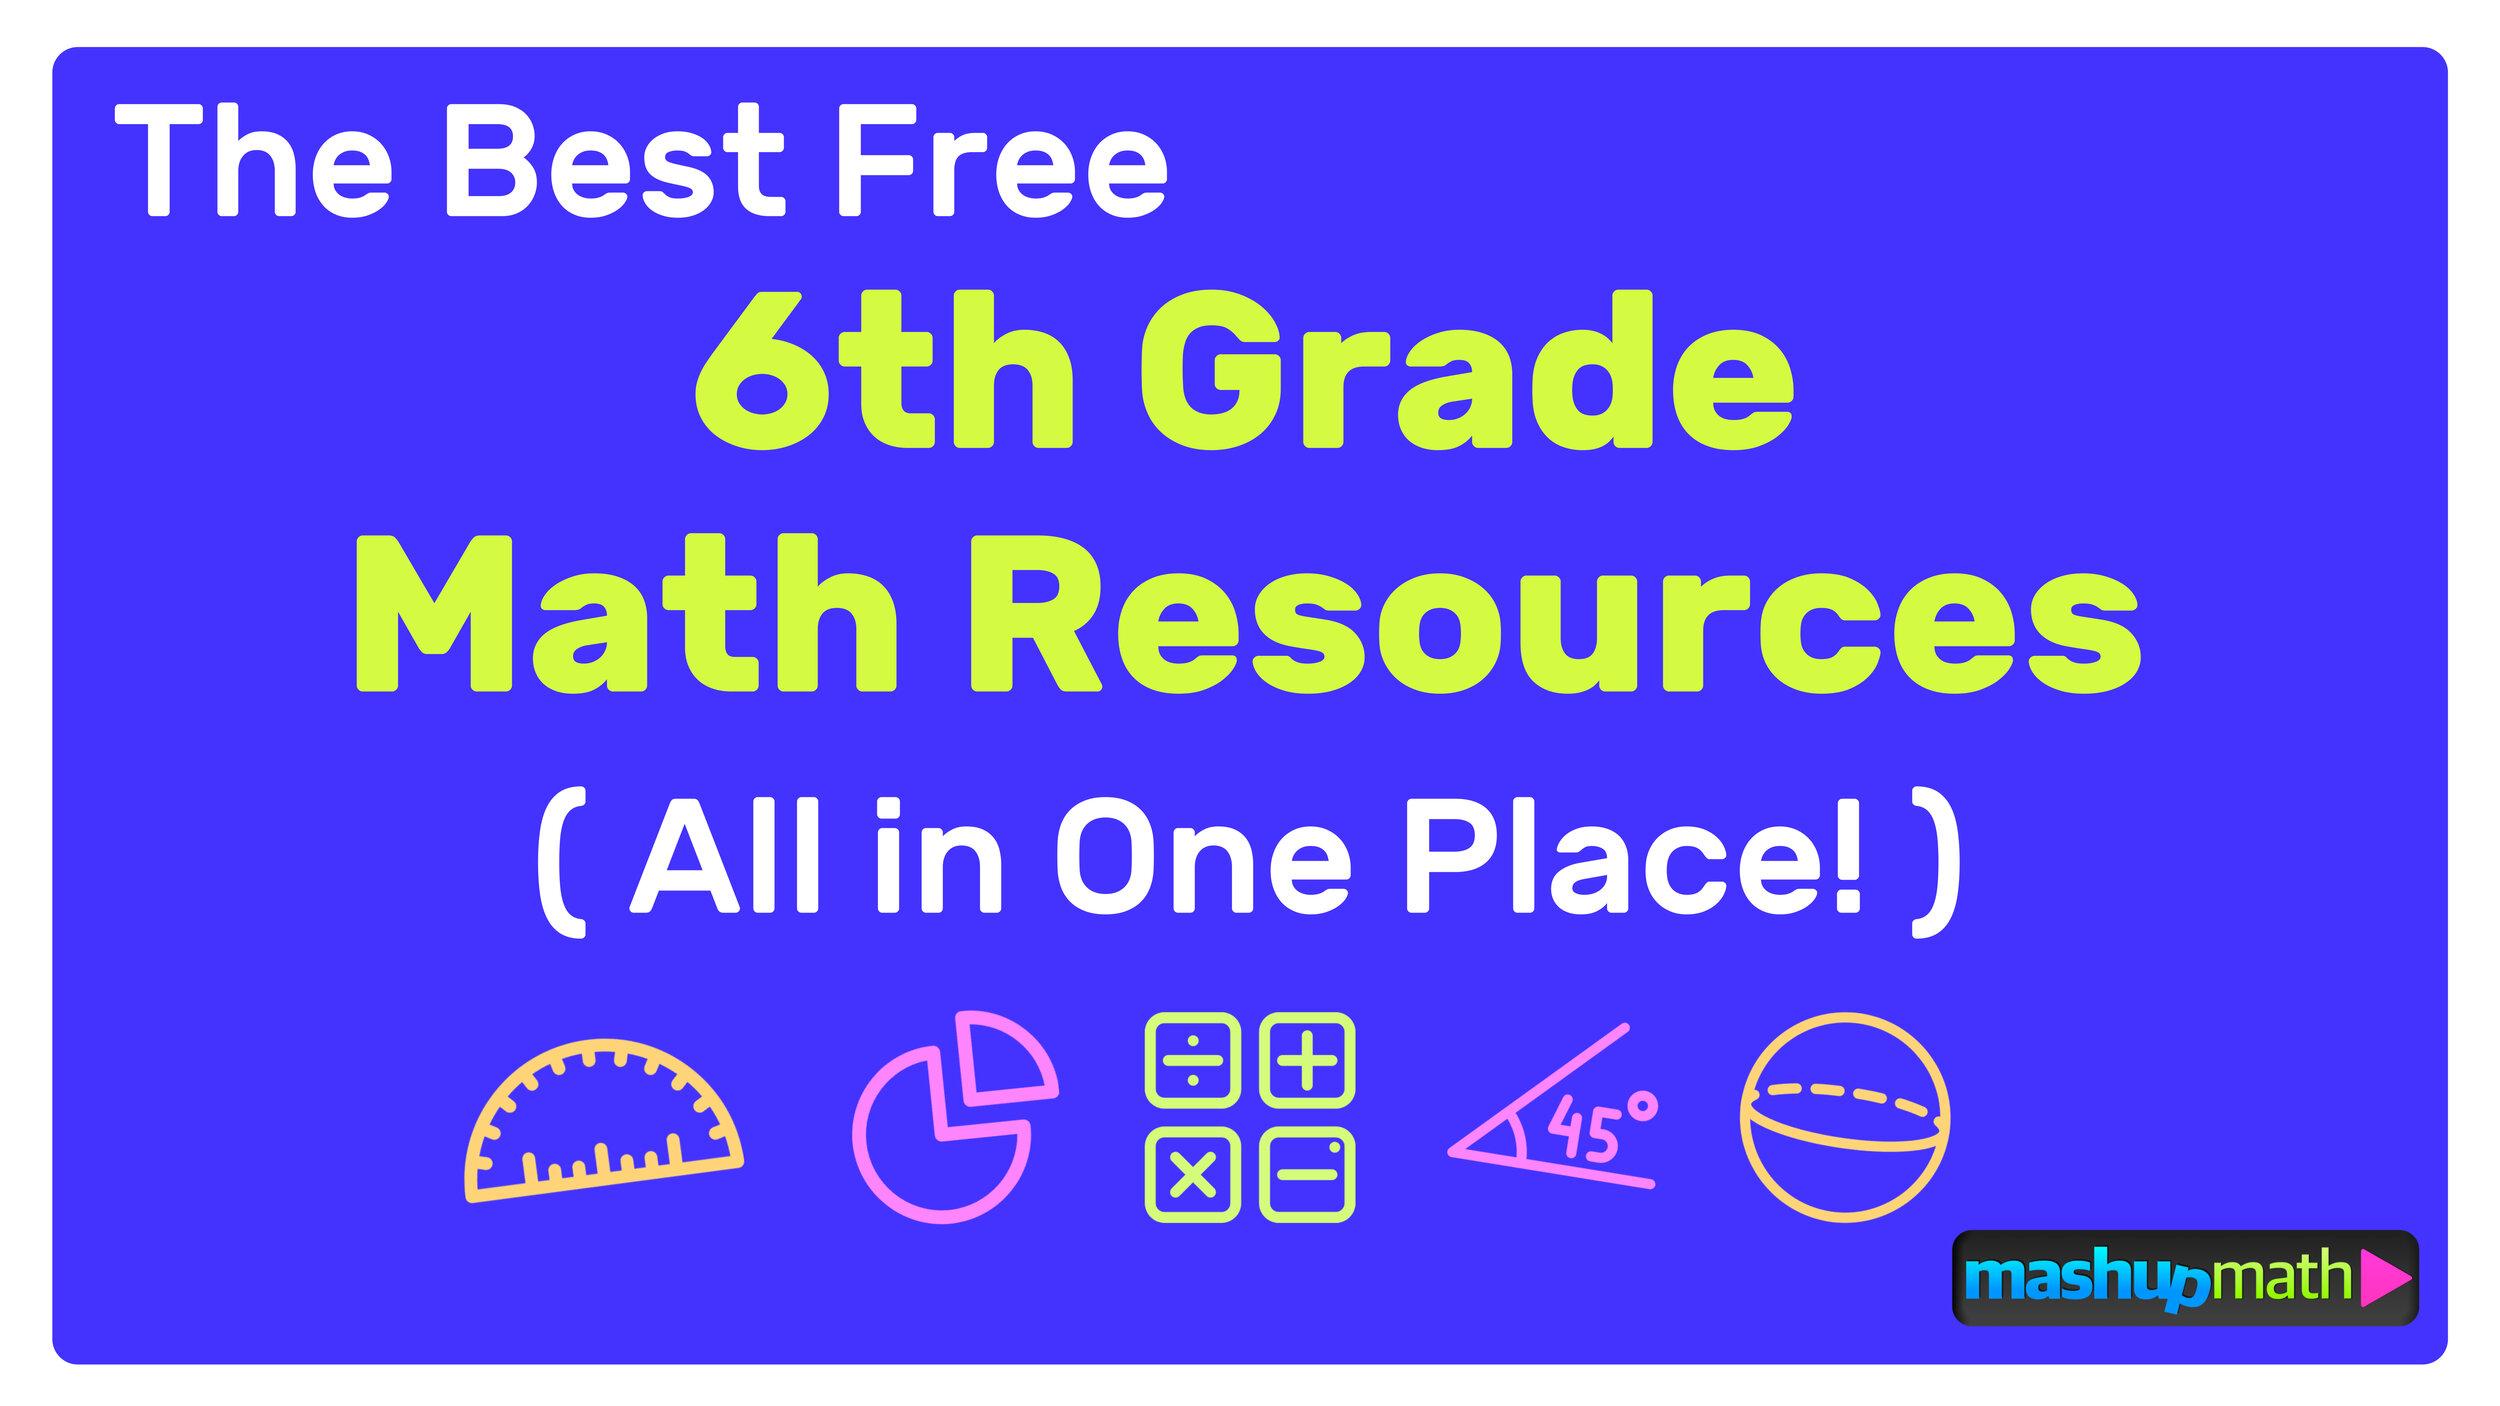 medium resolution of The Best Free 6th Grade Math Resources: Complete List! — Mashup Math